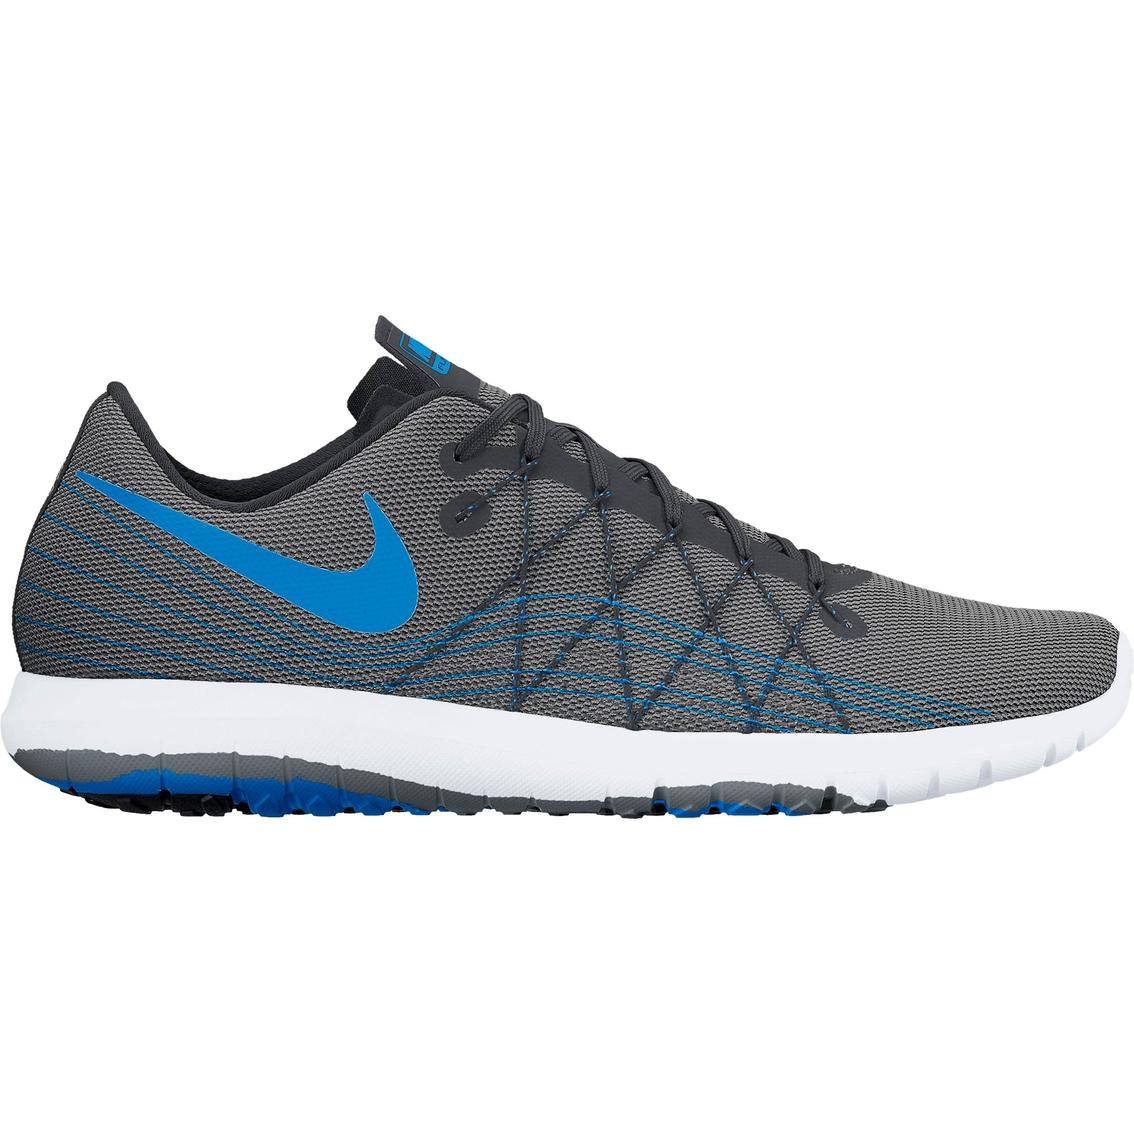 a9549cef185b Nike Men s Flex Fury 2 Running Shoes